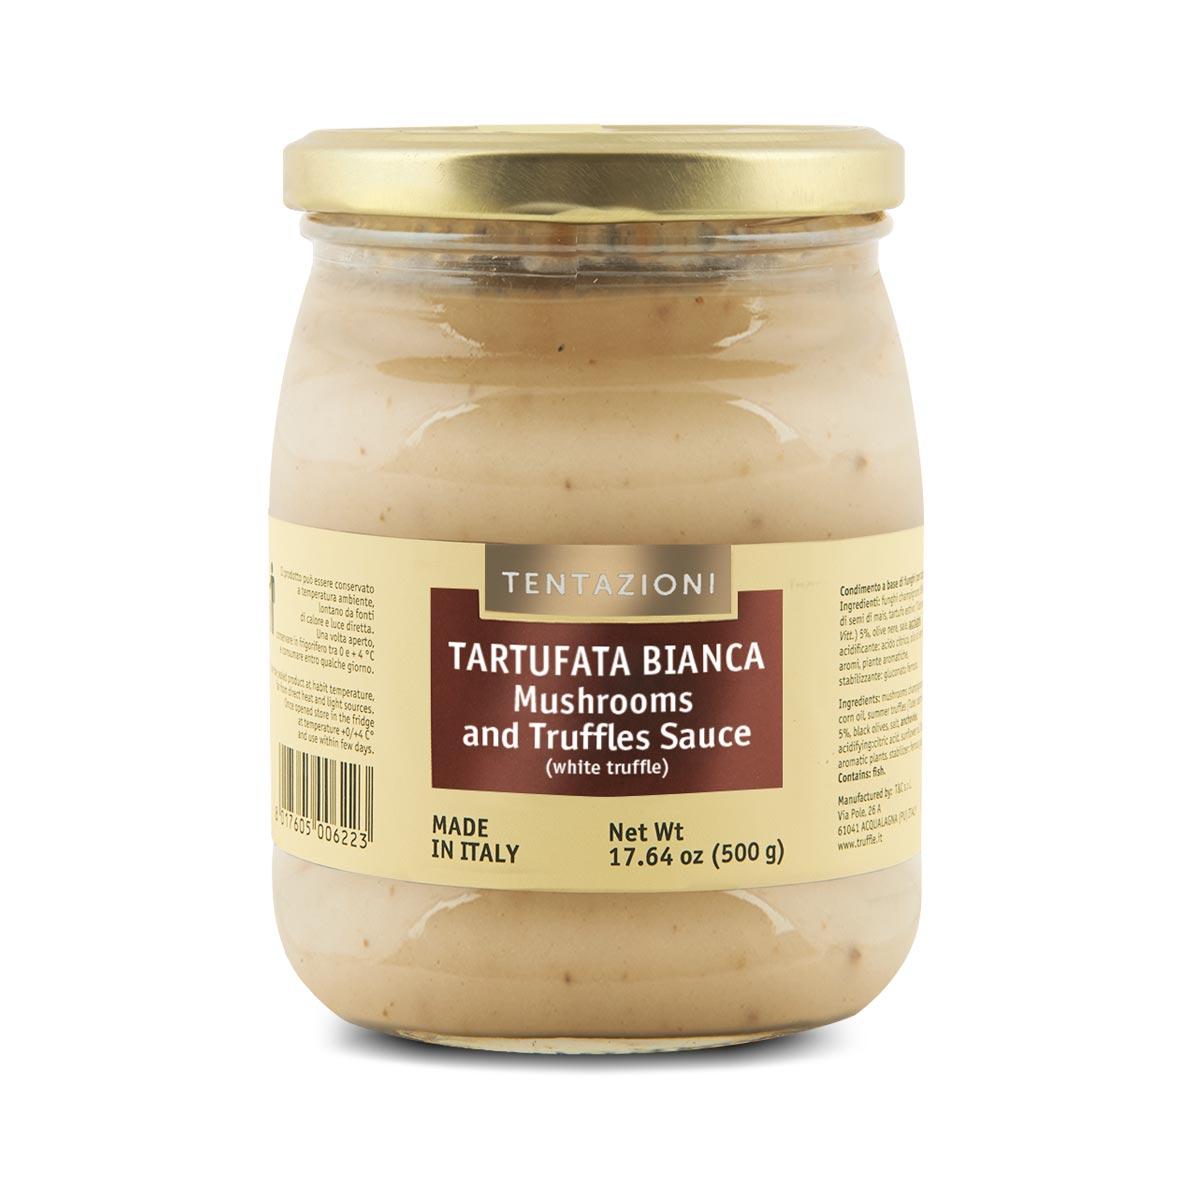 Tartufata Bianca (funghi, Porcini, Tart. Bianco) 500g